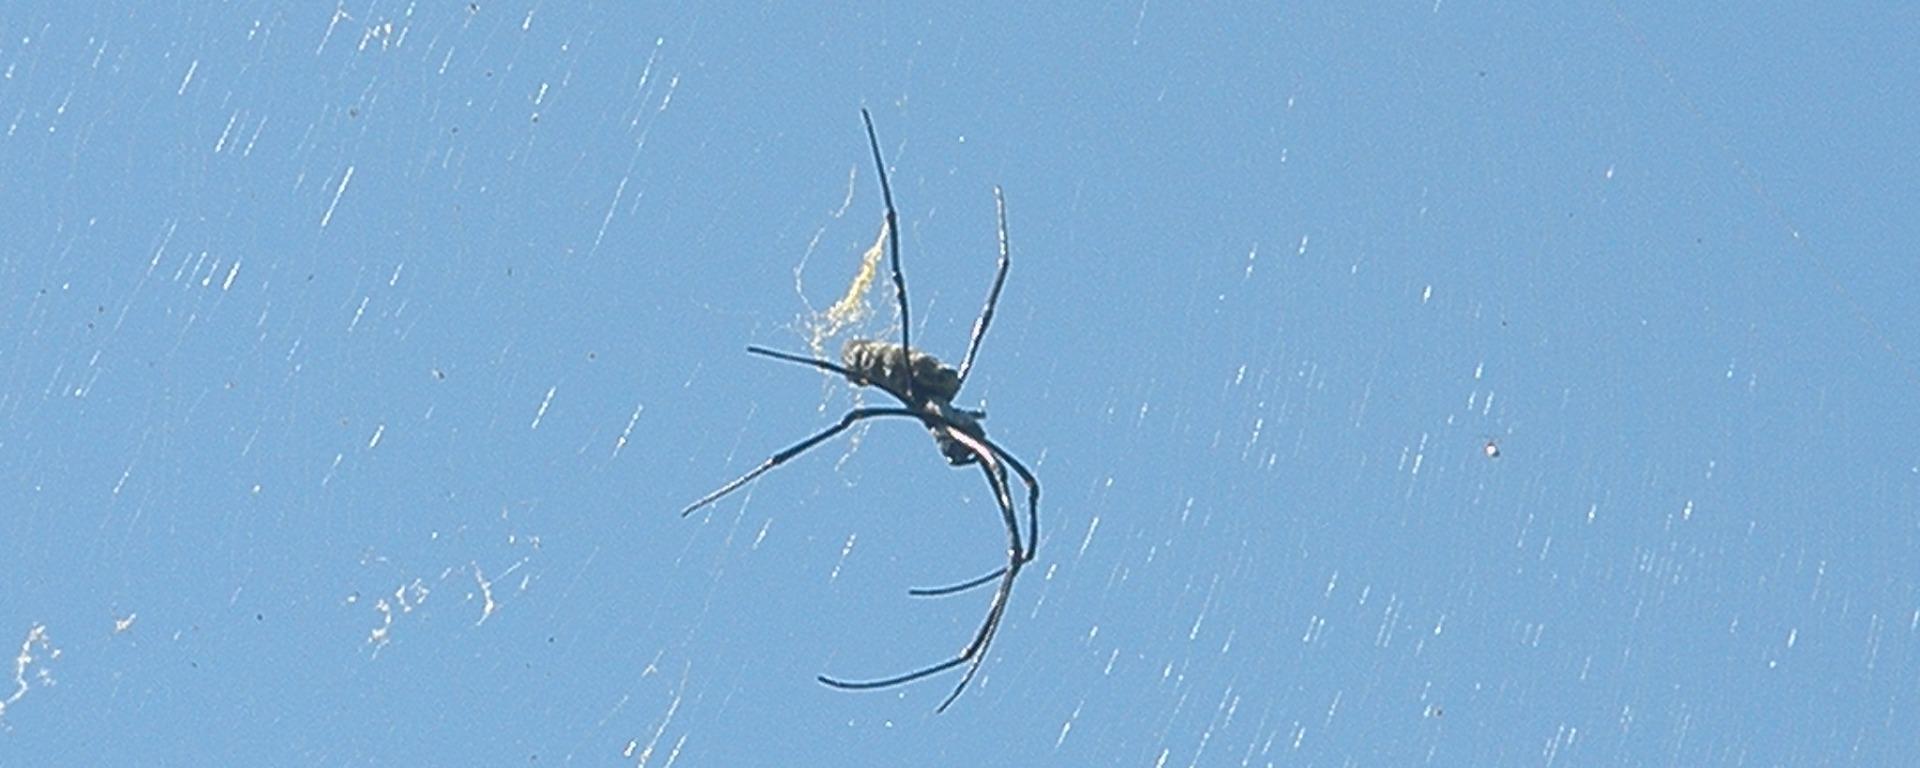 Spider, Gili Trawangan